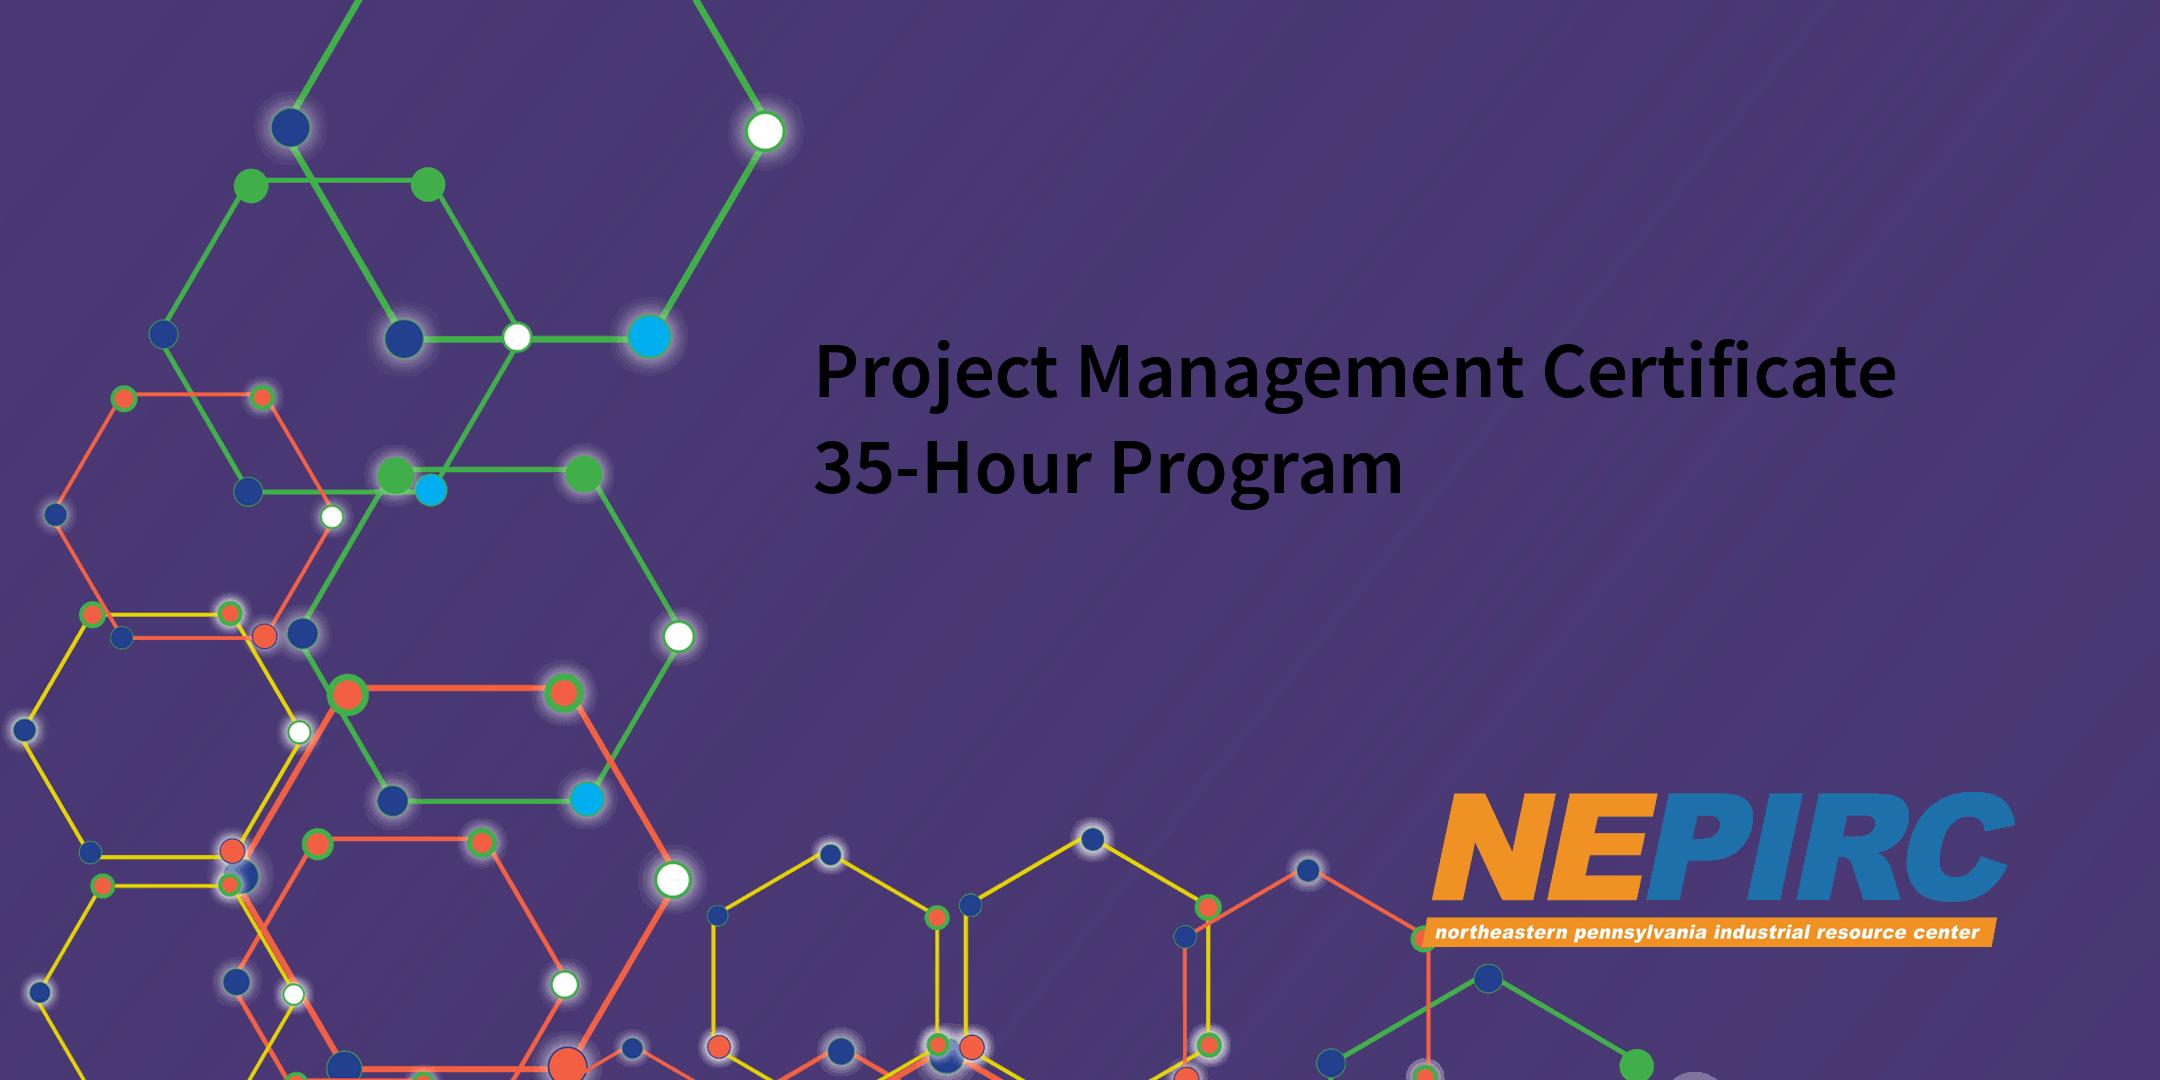 Project Management Certificate Program Nepirc Thursdays